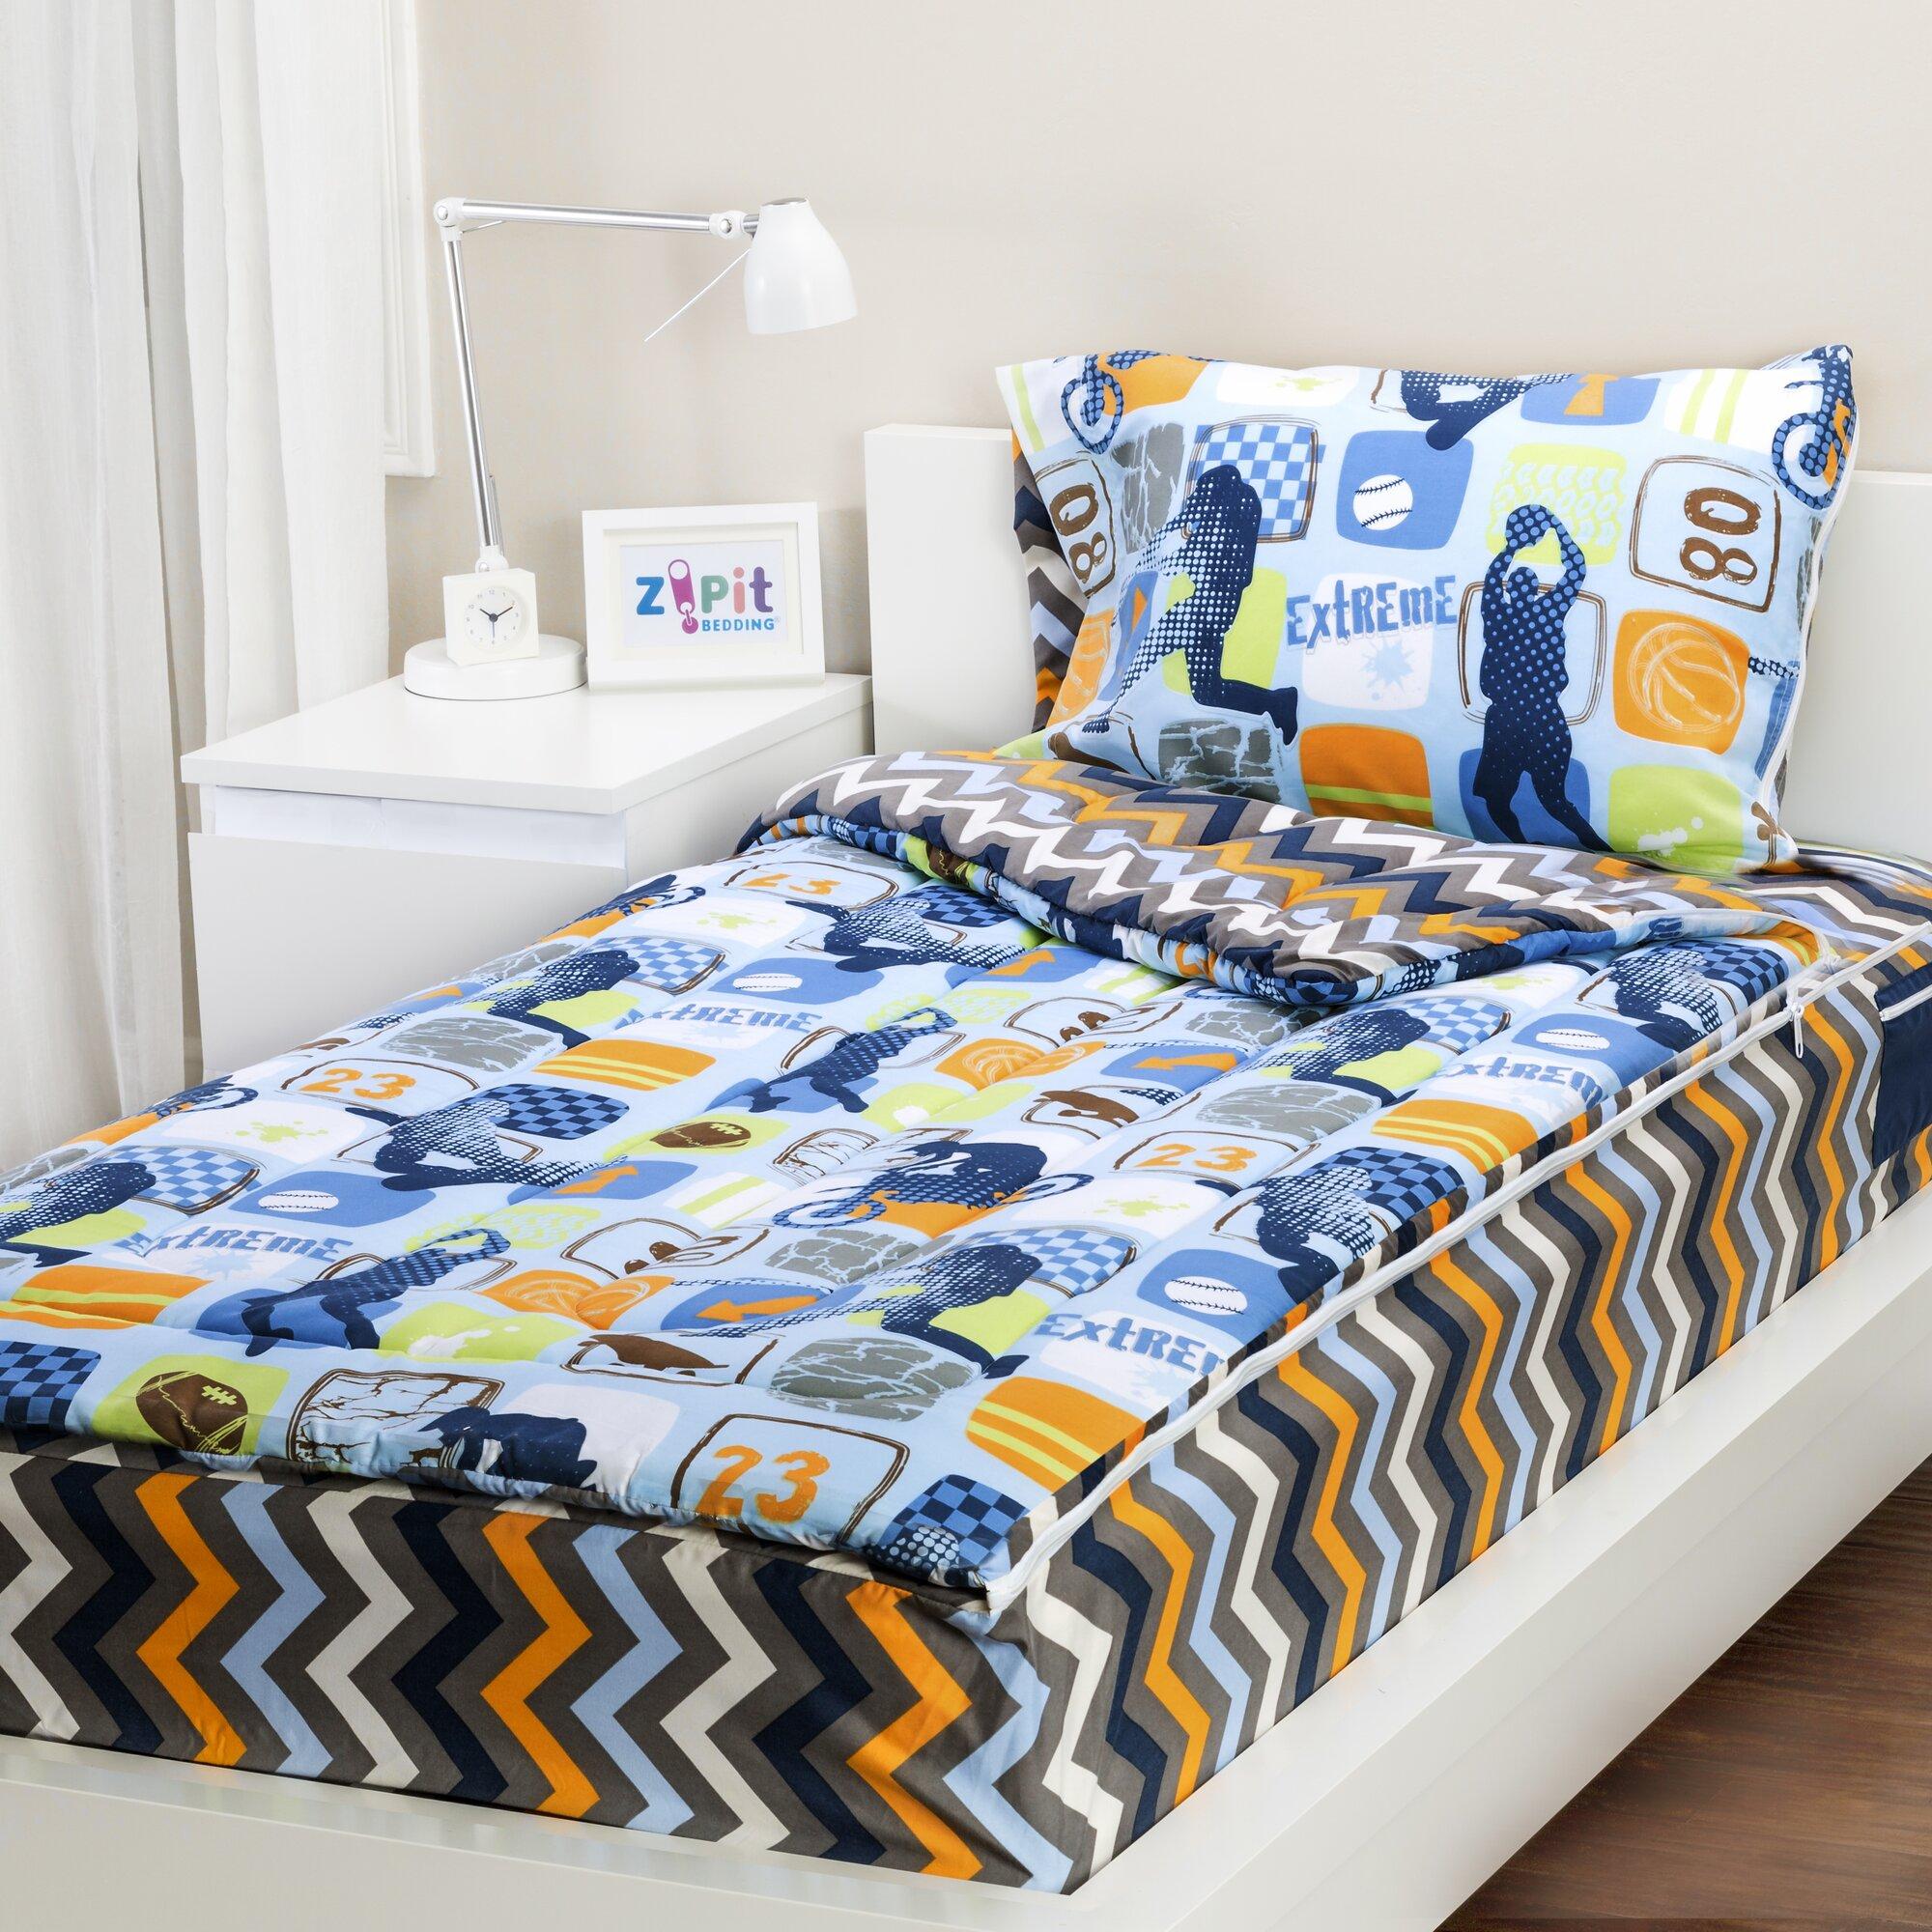 Zipit Bedding Extreme Sports 3 Piece Twin Comforter Set